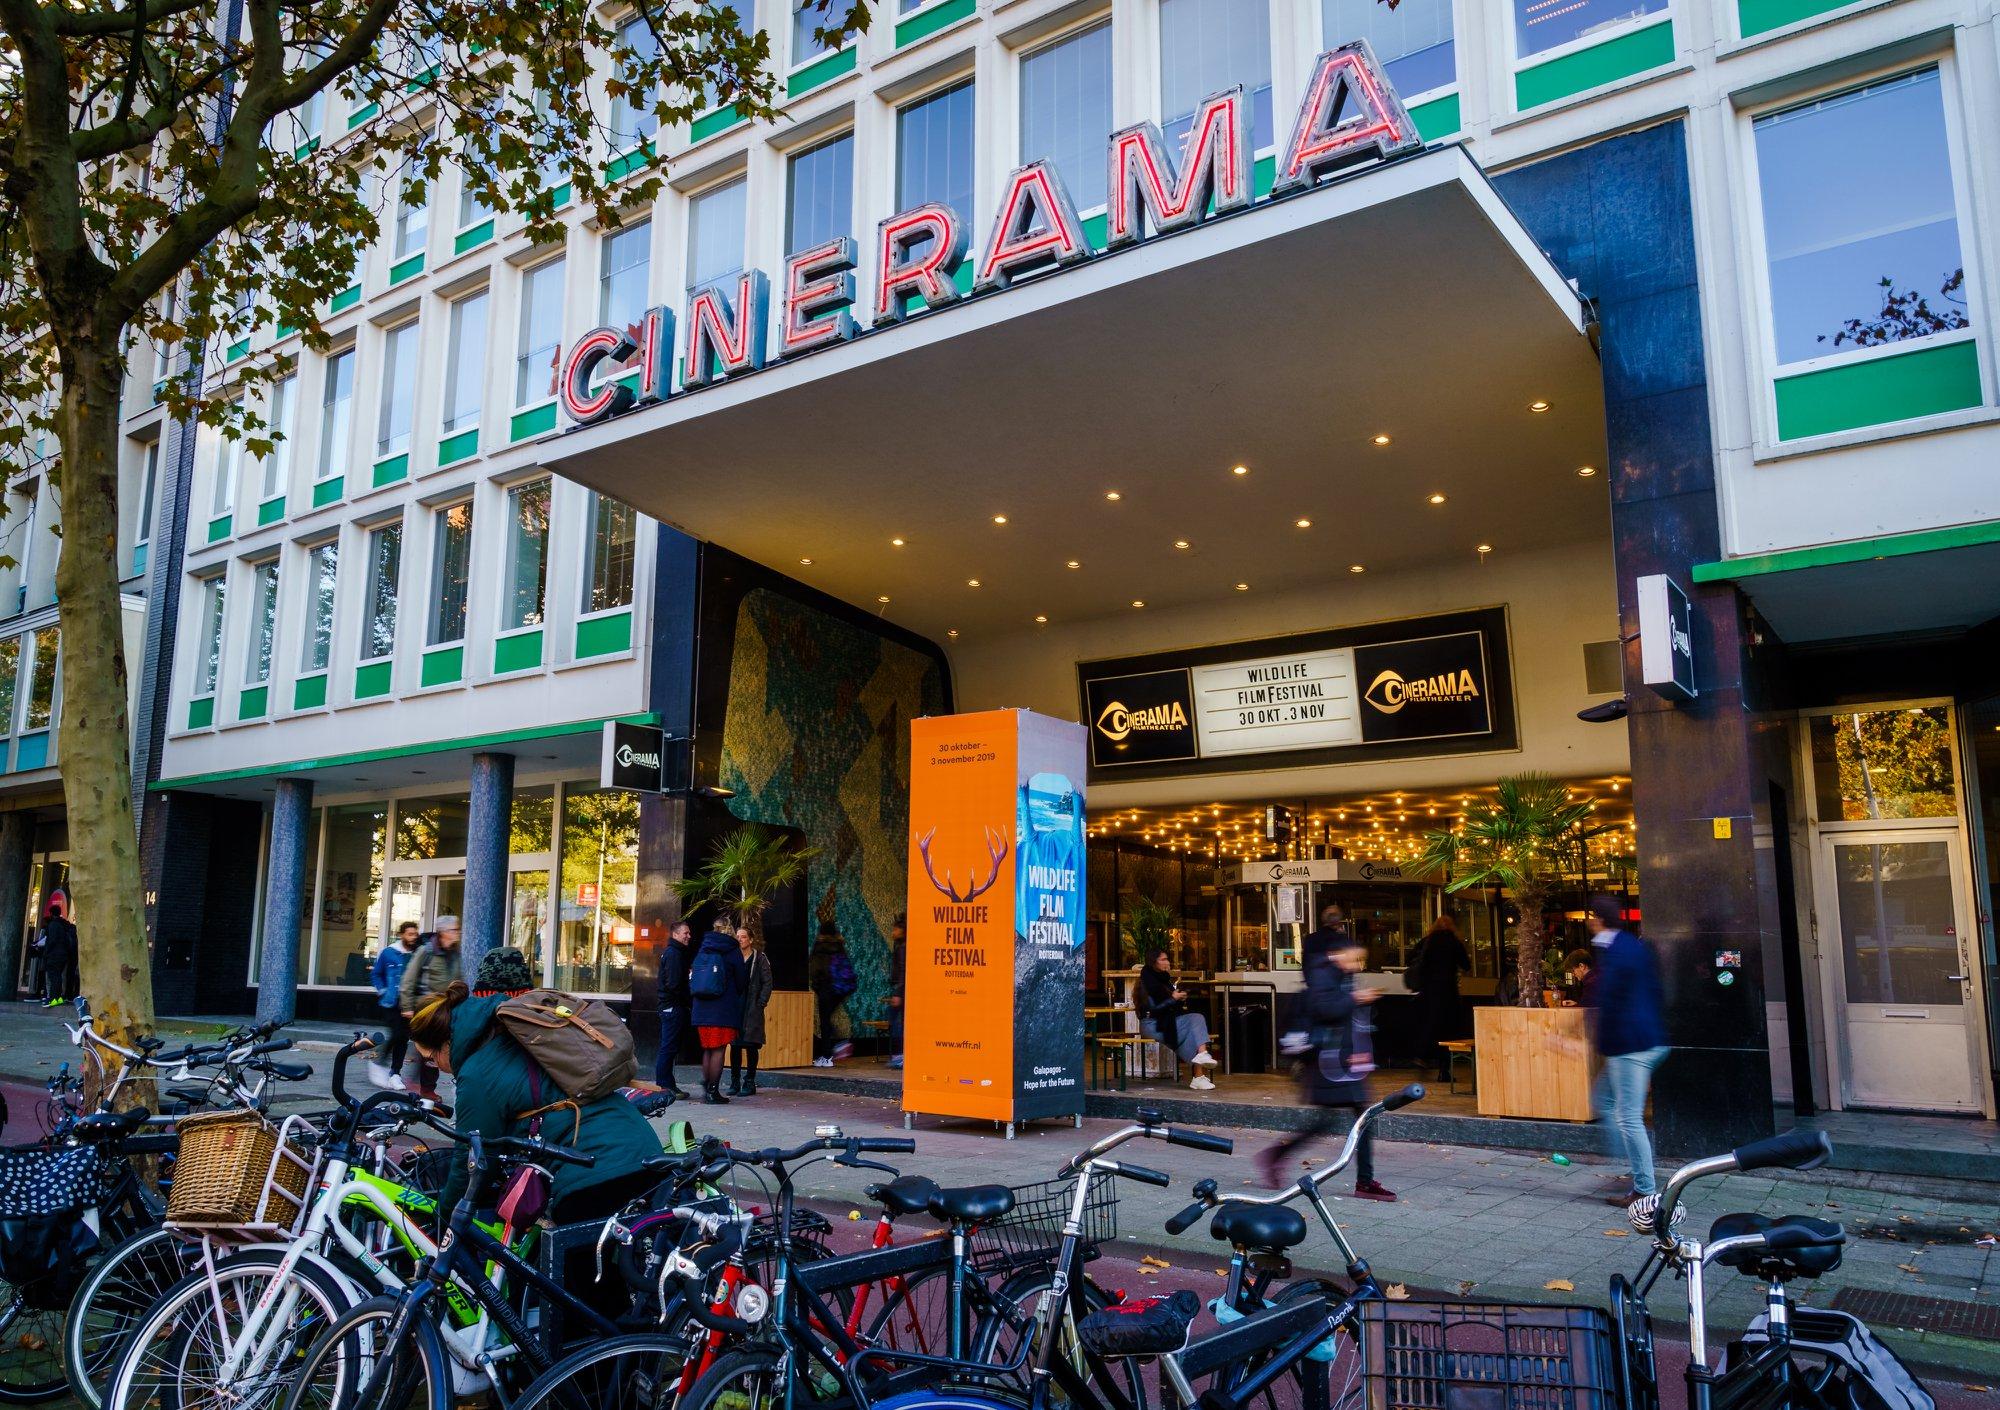 Wildlife Film Festival Rotterdam 2019 in Cinerama - Foto: WFFR